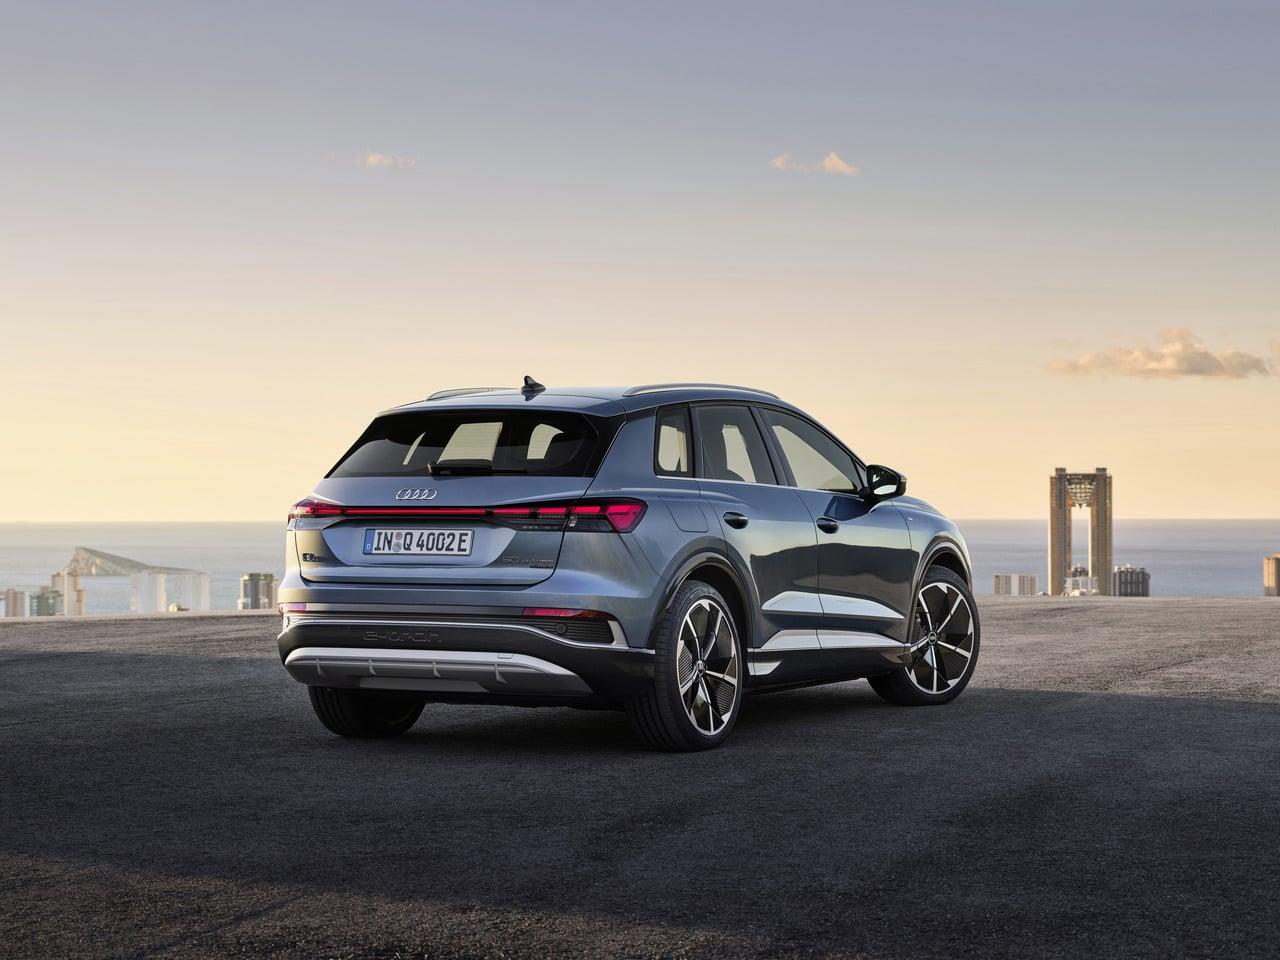 Audi Q4 e-tron und der Q4 Sportback e-tron | Audi Q4 50 e tron quattro  55